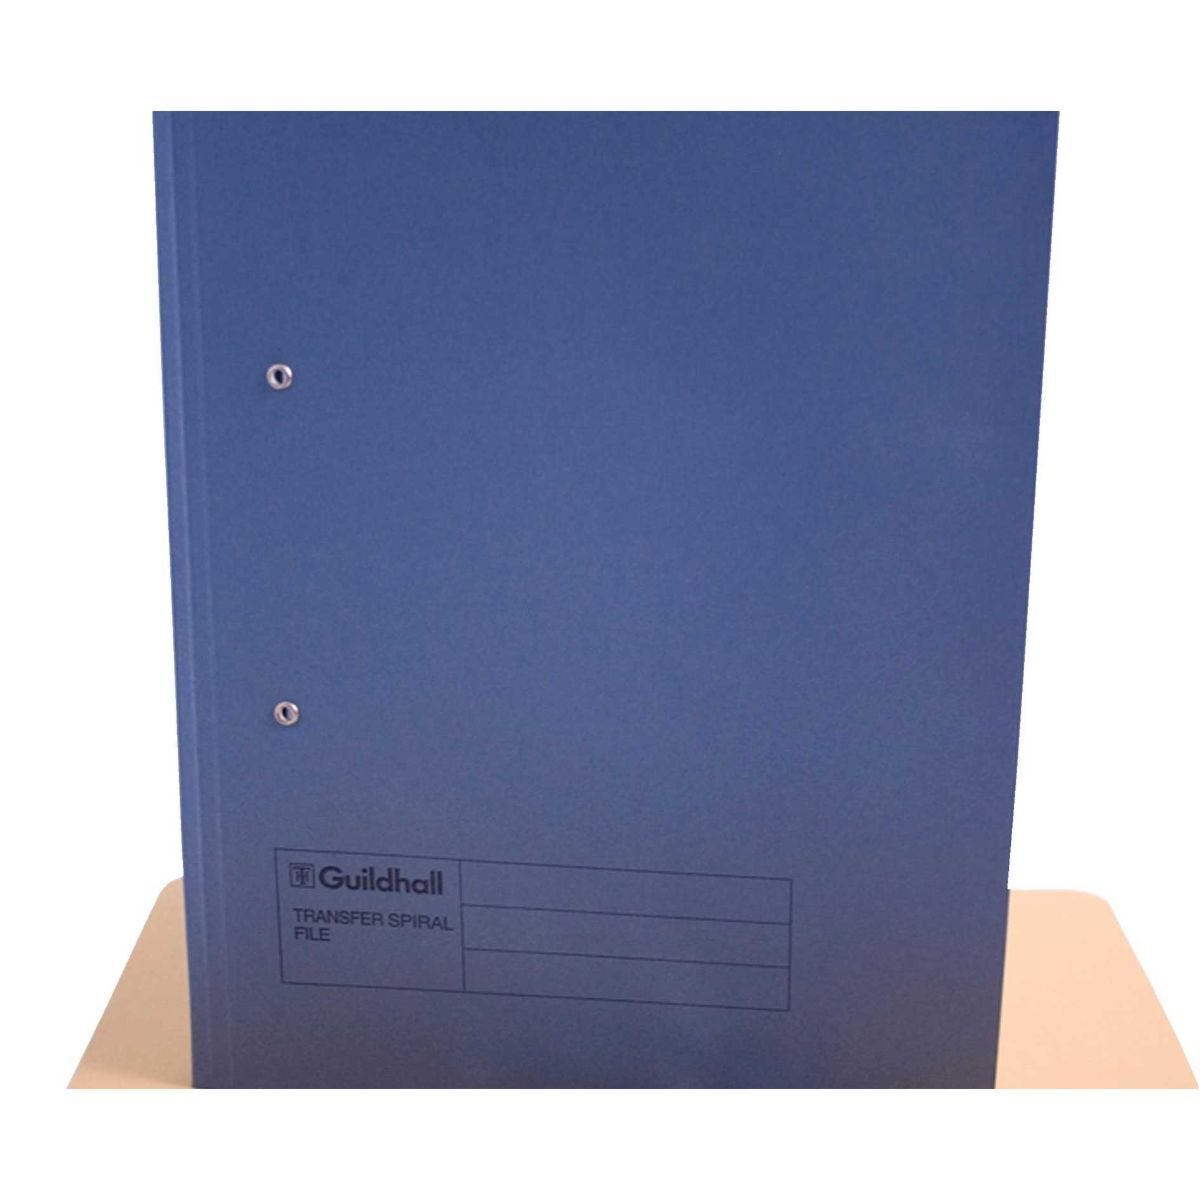 Transfer Spiral File Foolscap Pack of 50 Blue